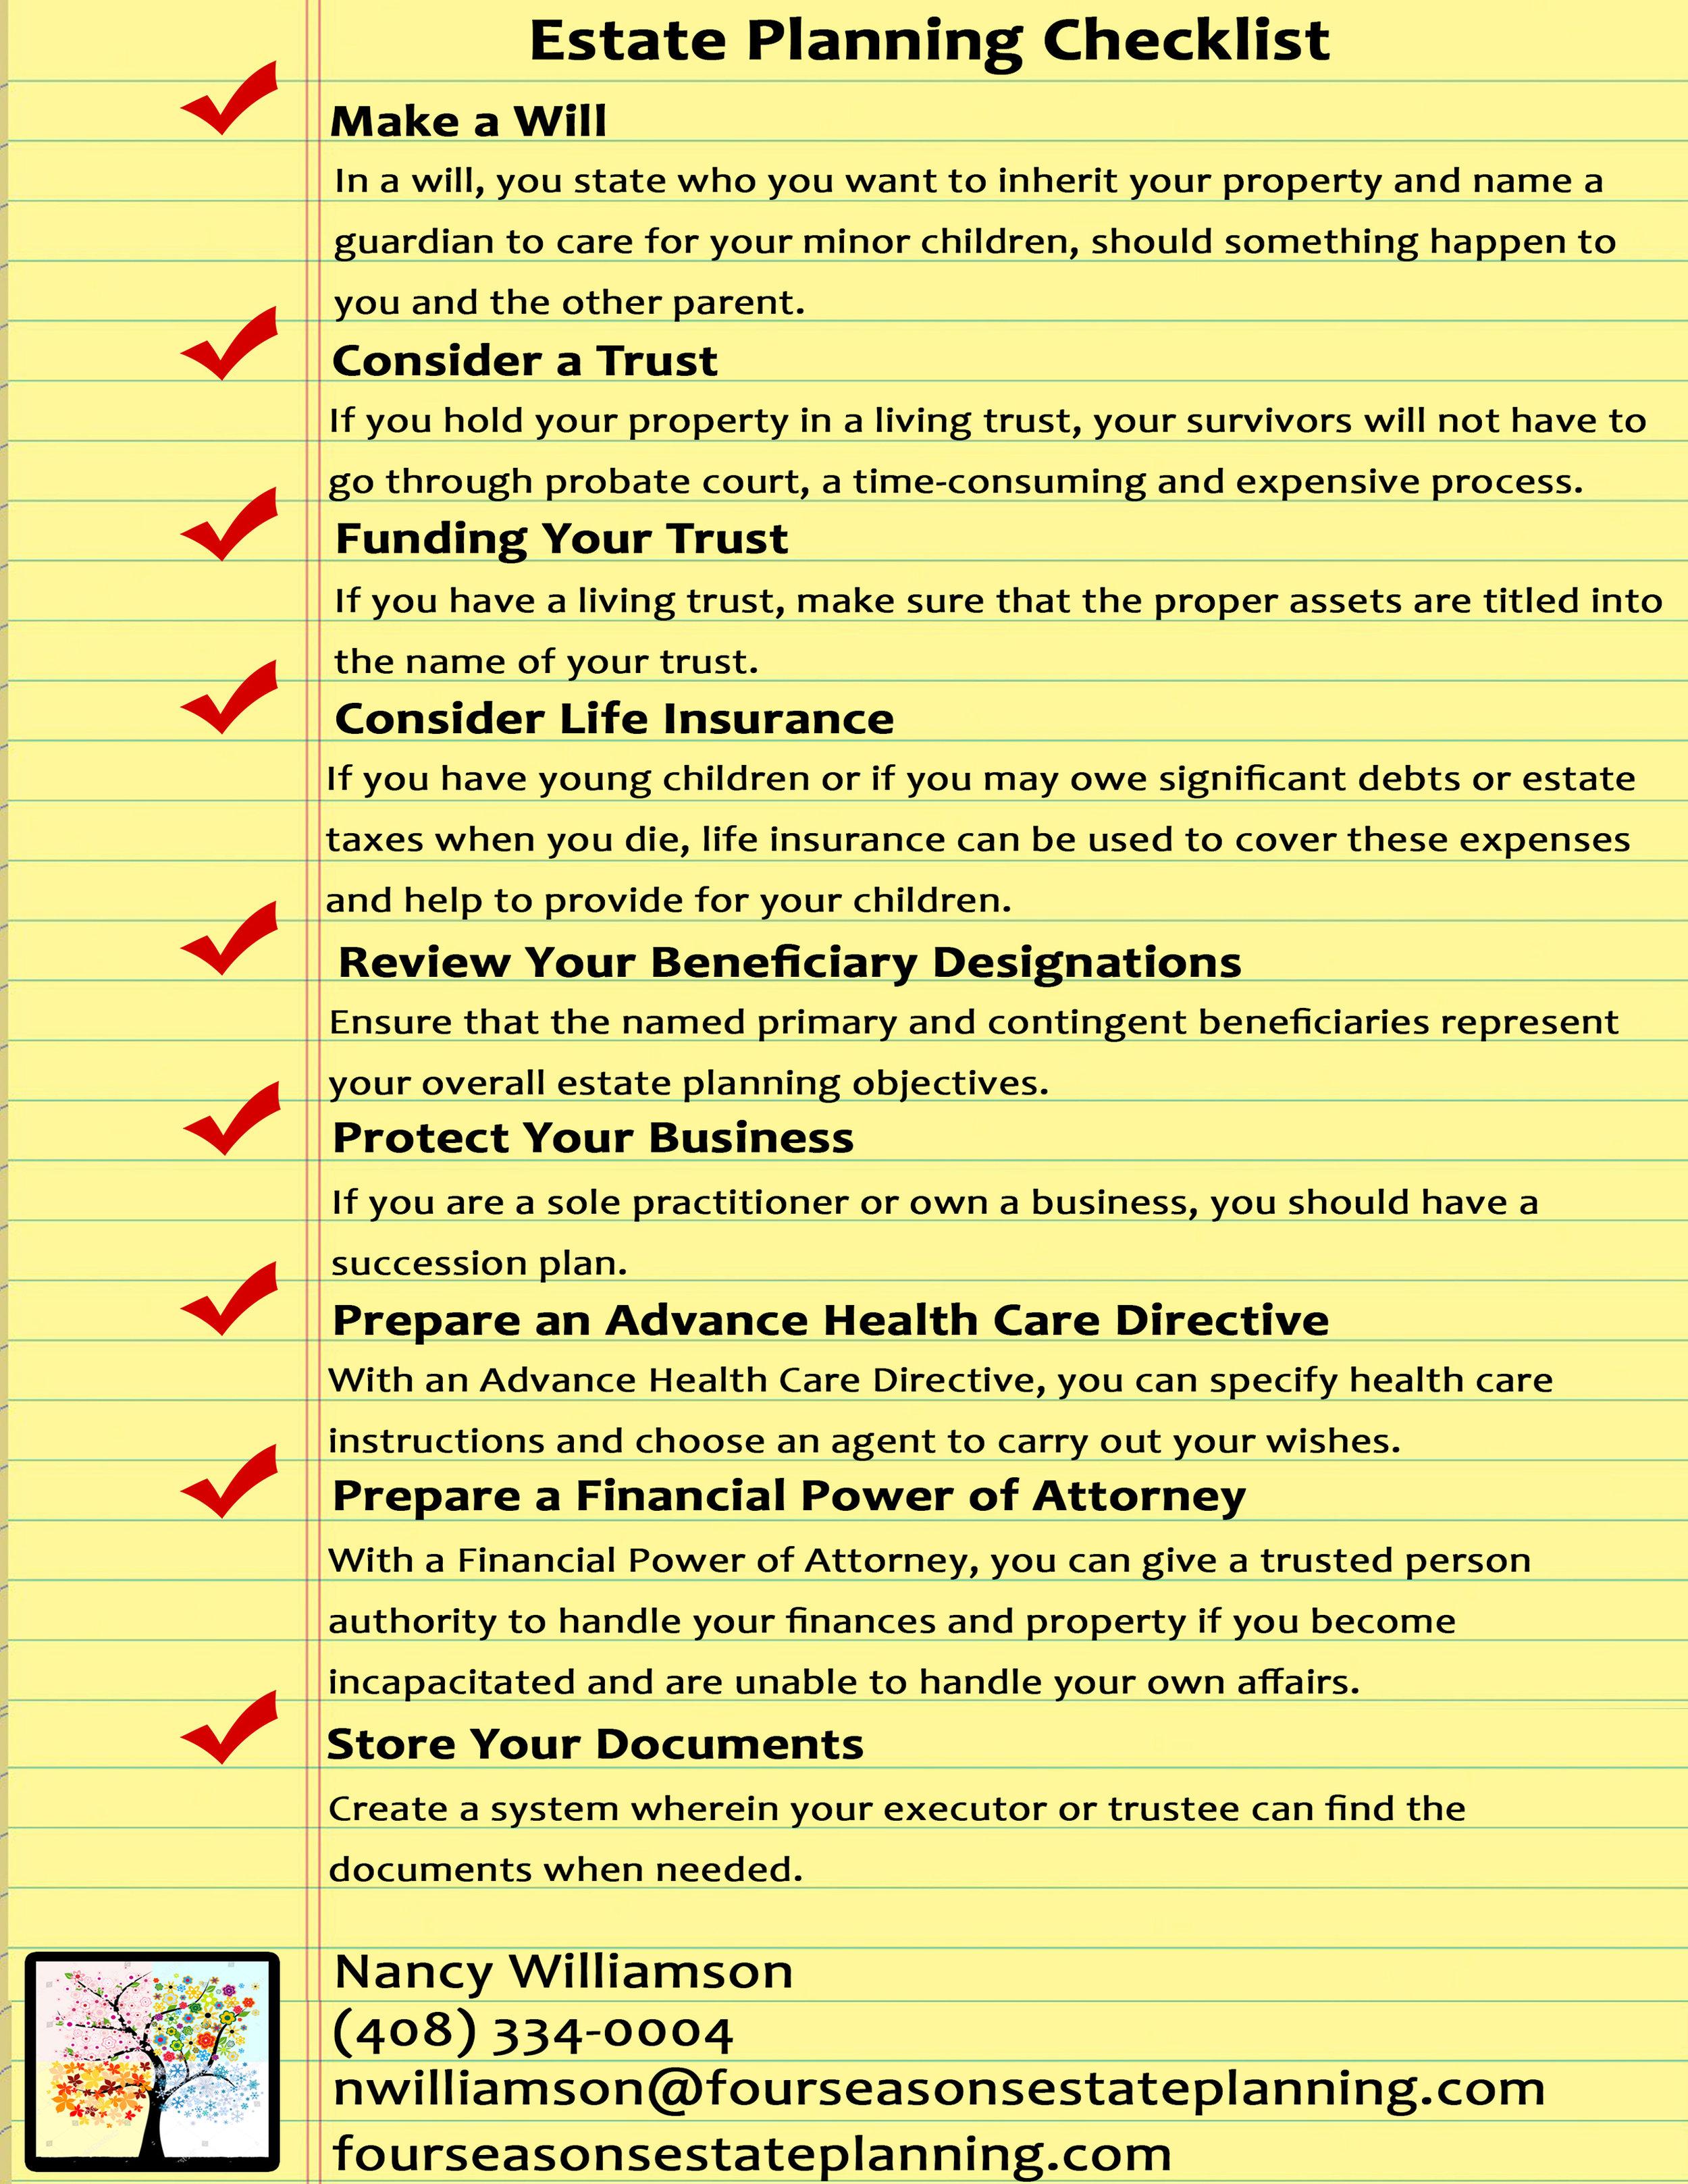 EP Checklist on a legal pad.jpg